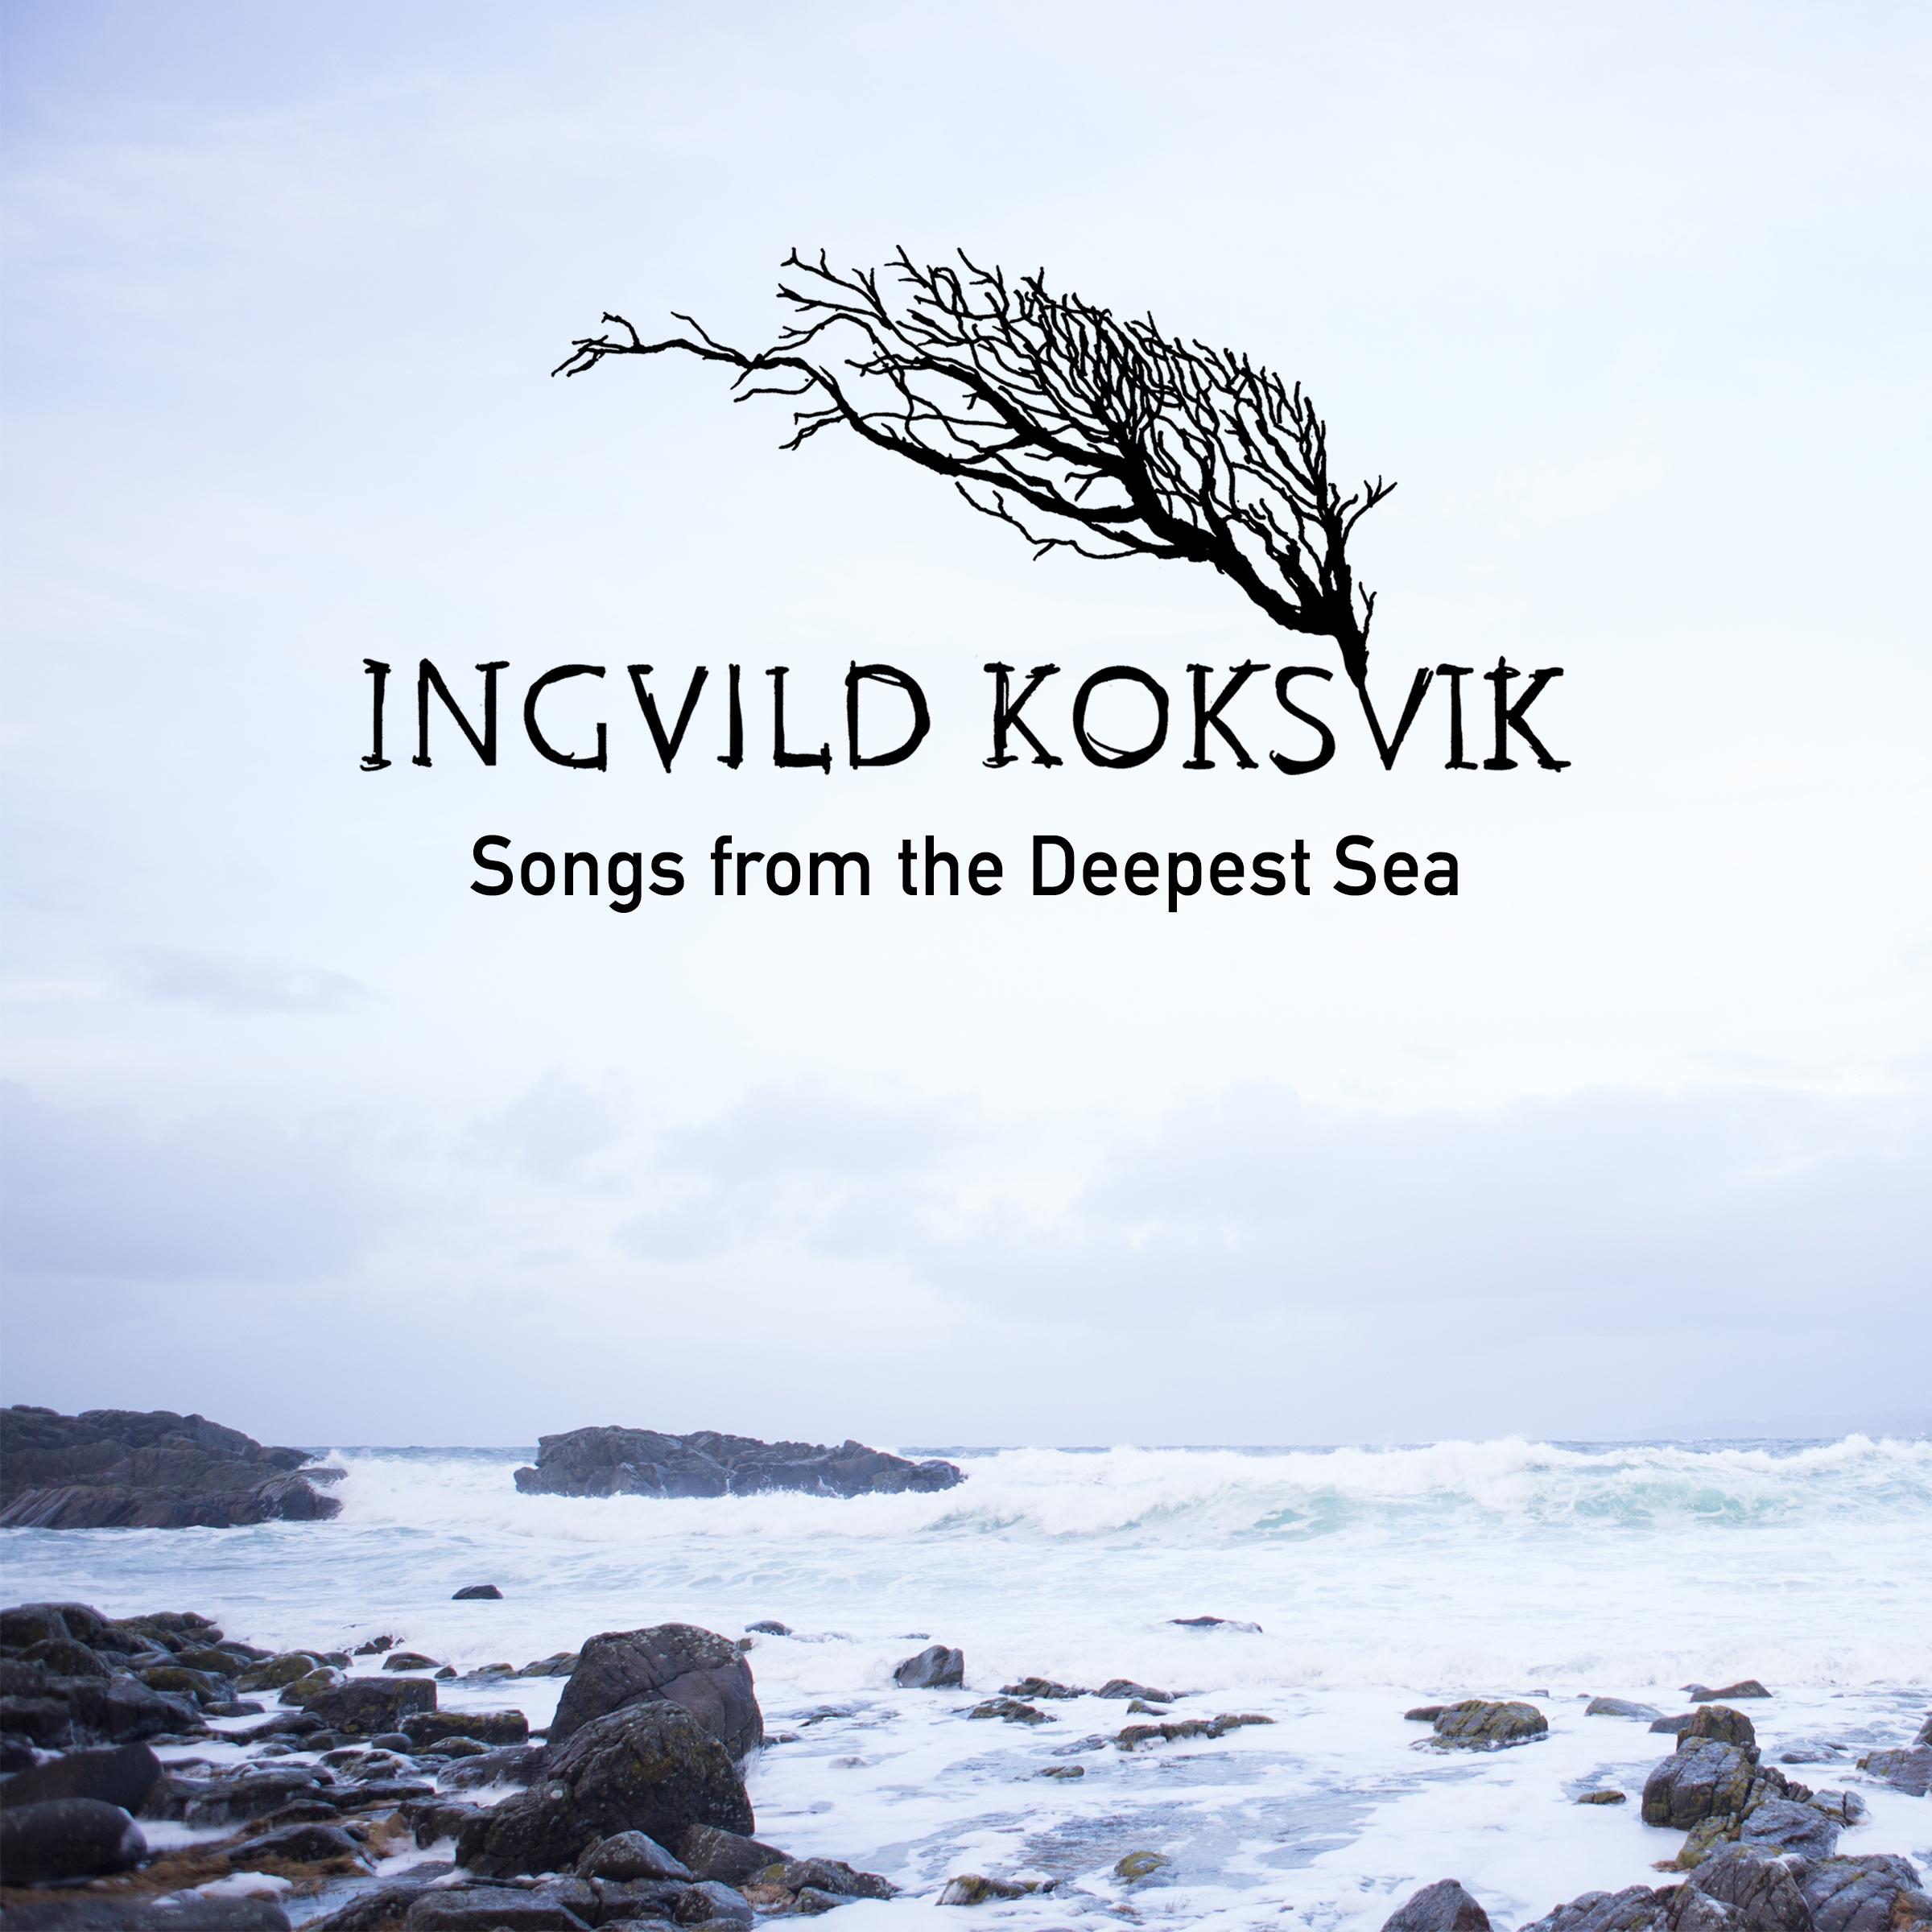 Ingvild Koksvik - Songs from the Deepest Sea - digital cover.jpg